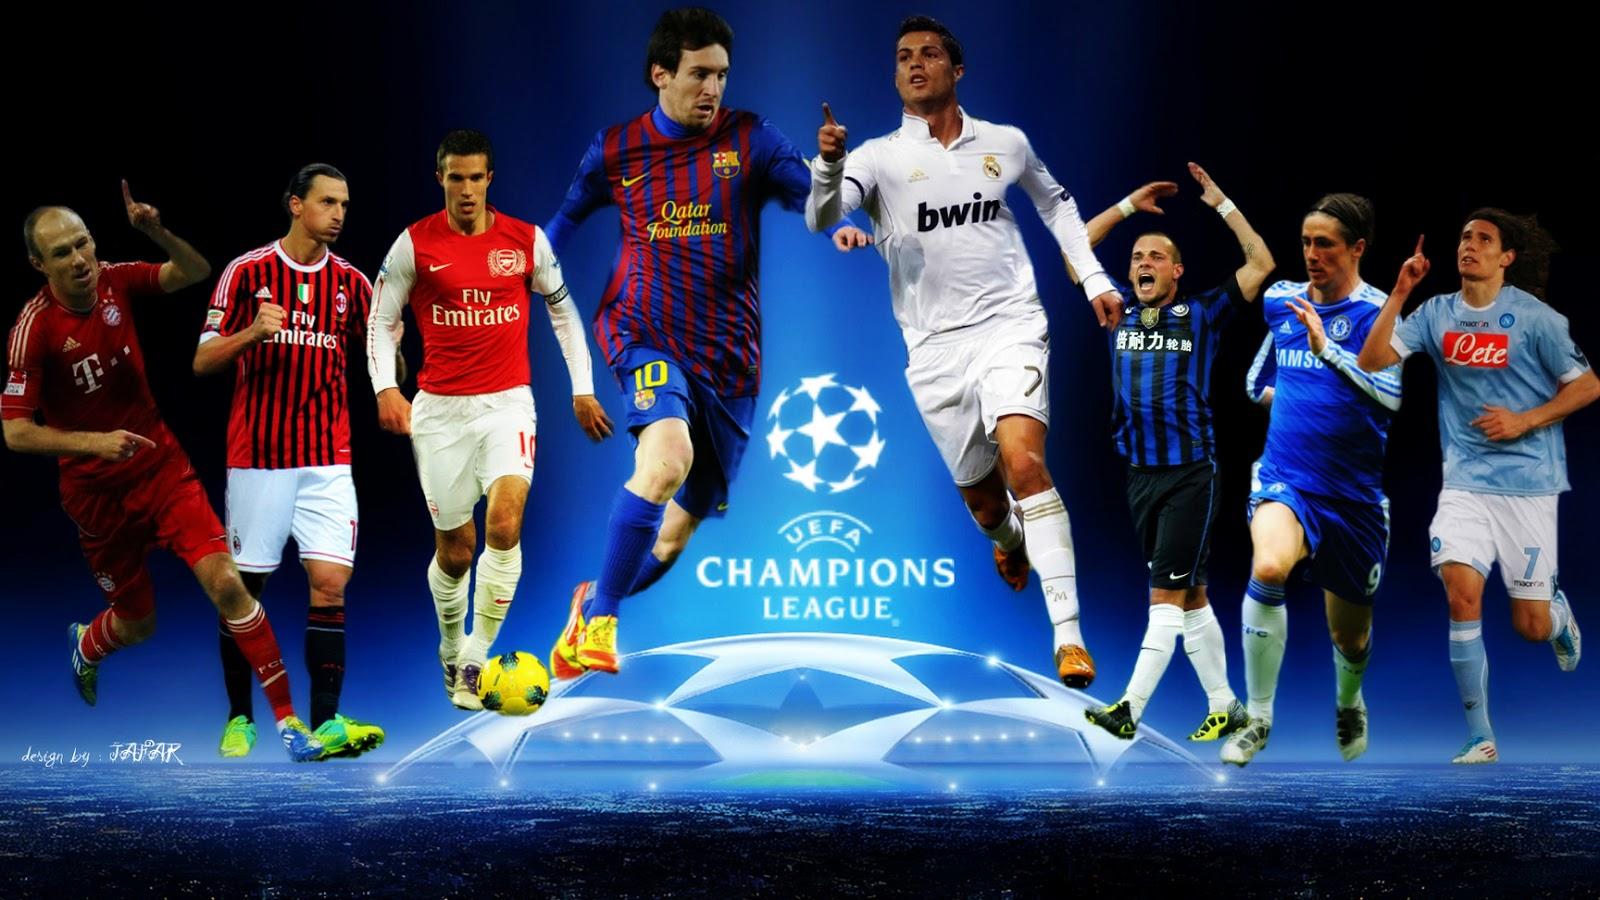 Champions League wallpaper HD 1280x800 1600x900